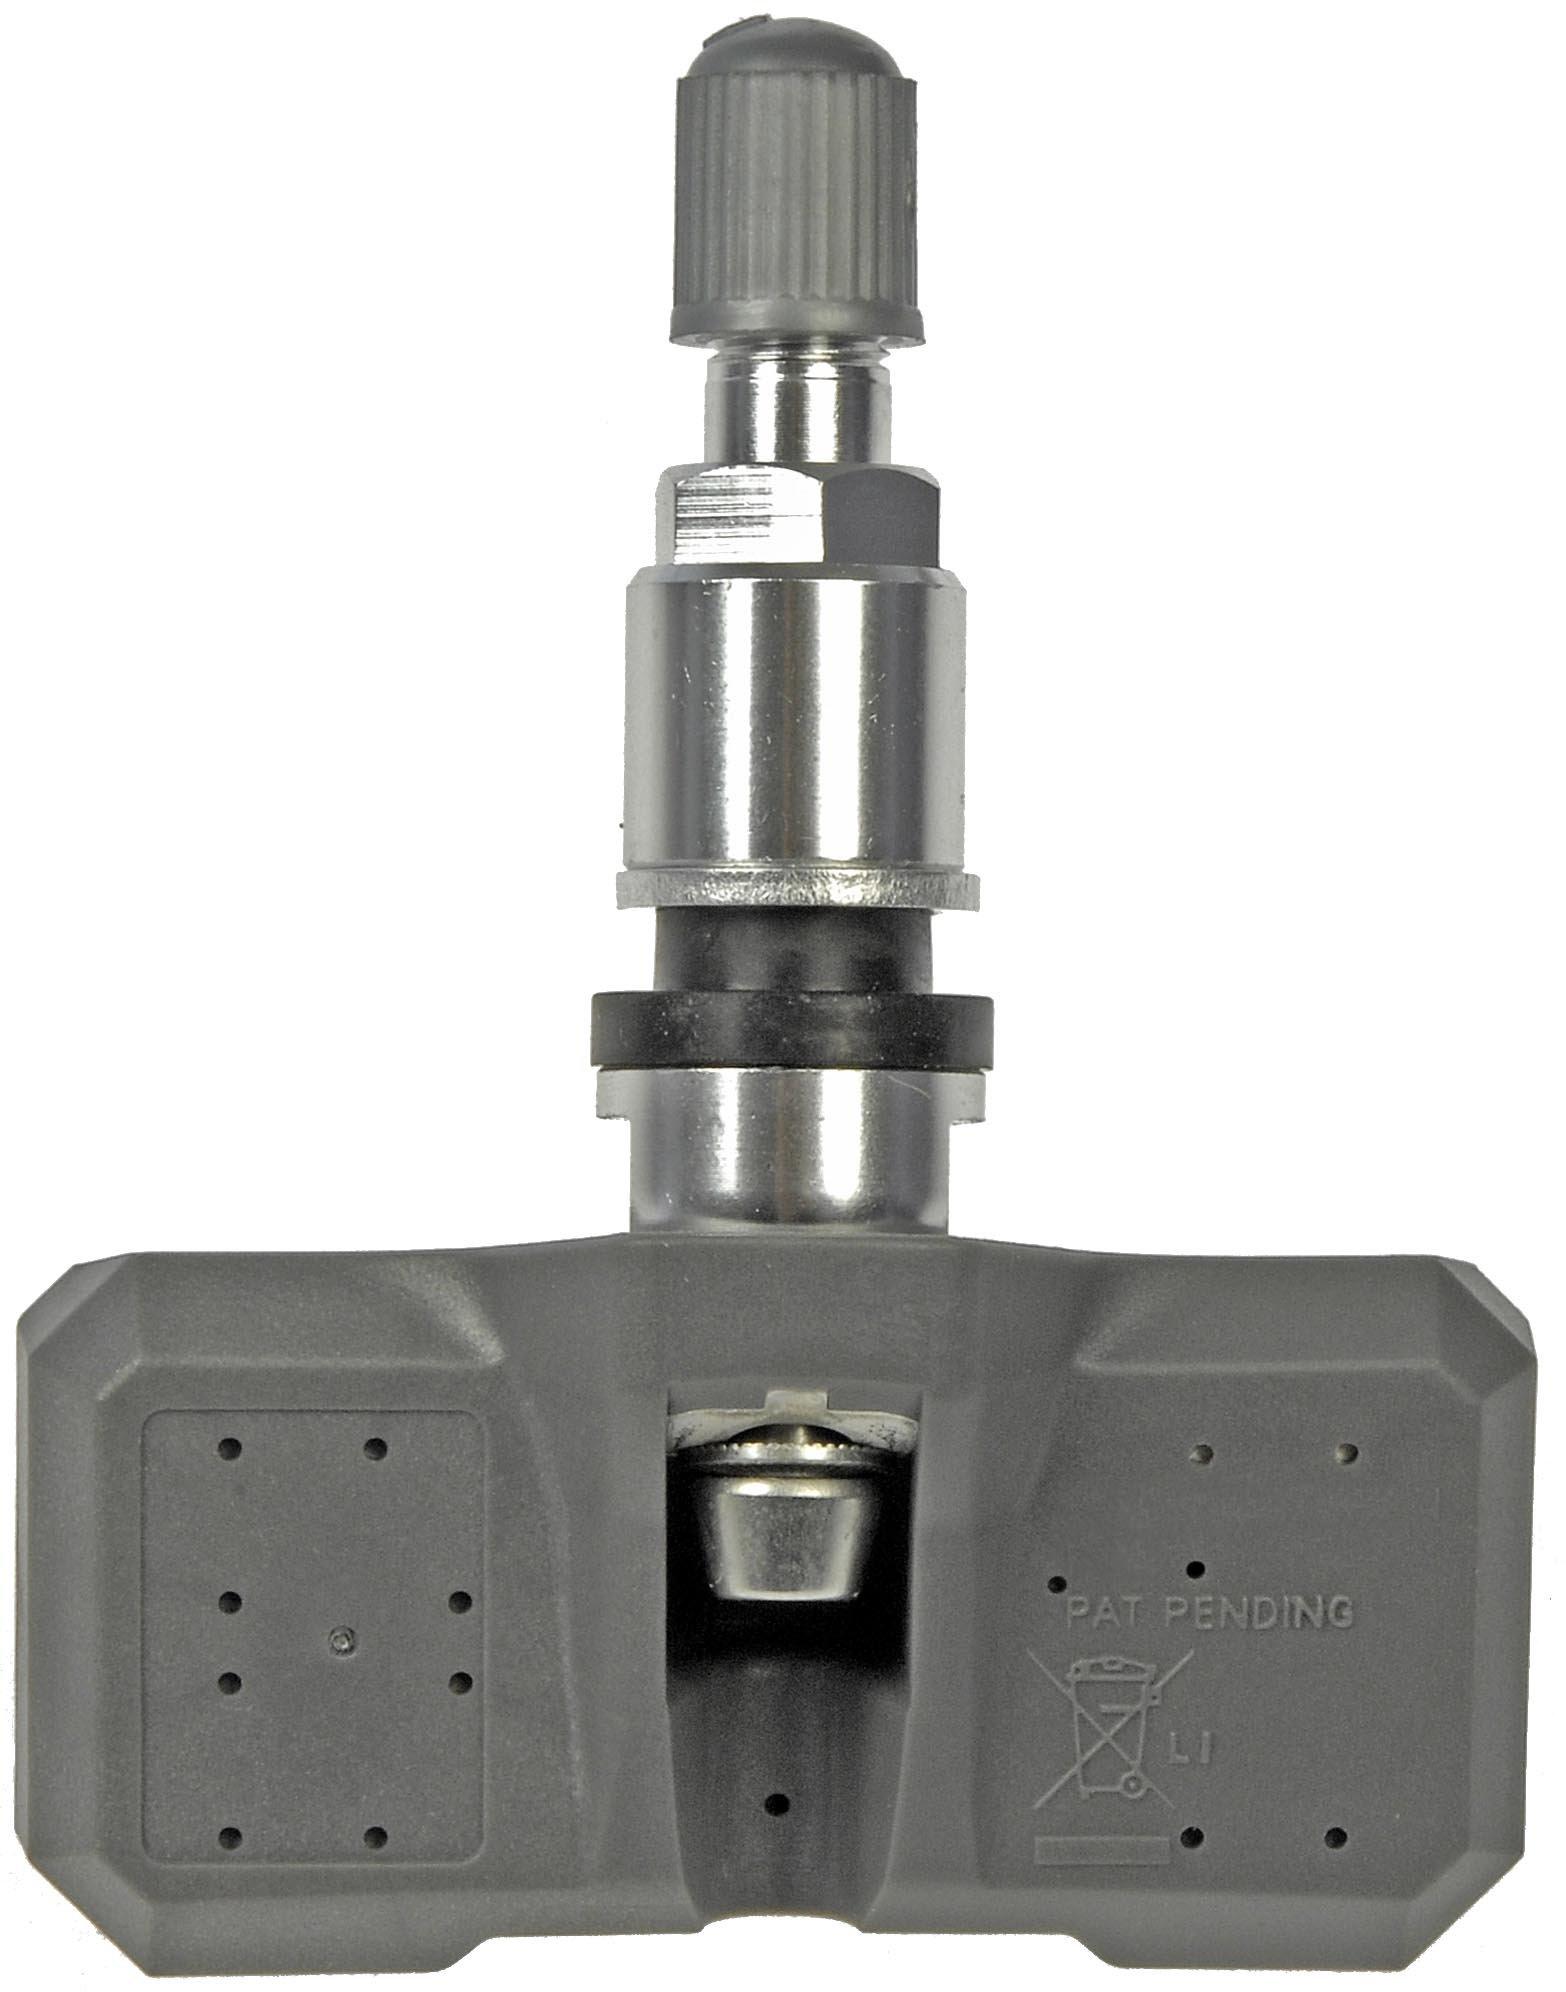 Dorman 974-001 Dorman DiRECT-FIT 315 MHz Tire Pressure Monitoring System Sensor for Select Models by Dorman